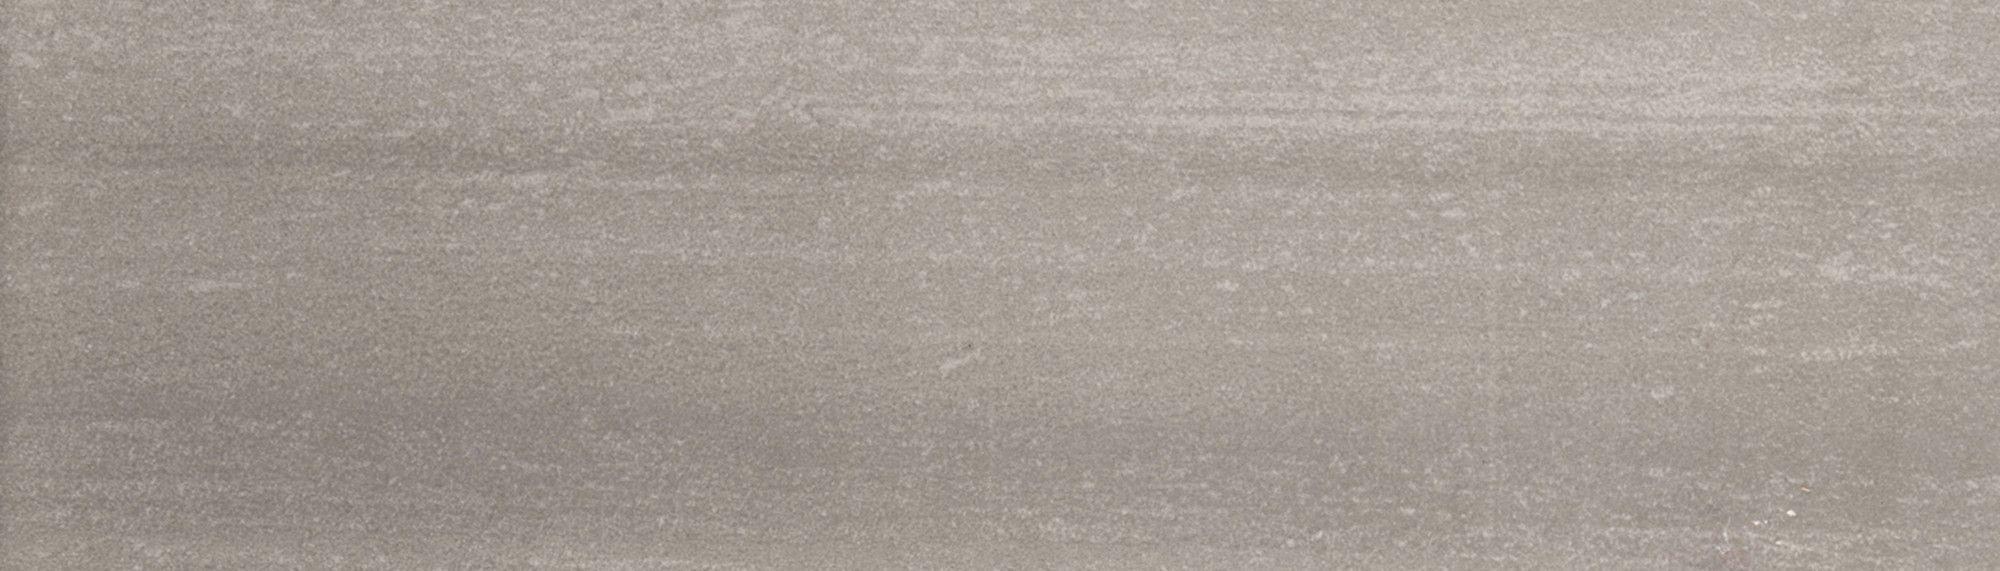 "Decorative Bullnose Tile Trim Custom Perspective 12"" X 3"" Bullnose Tile Trim In Gray  Products Design Decoration"